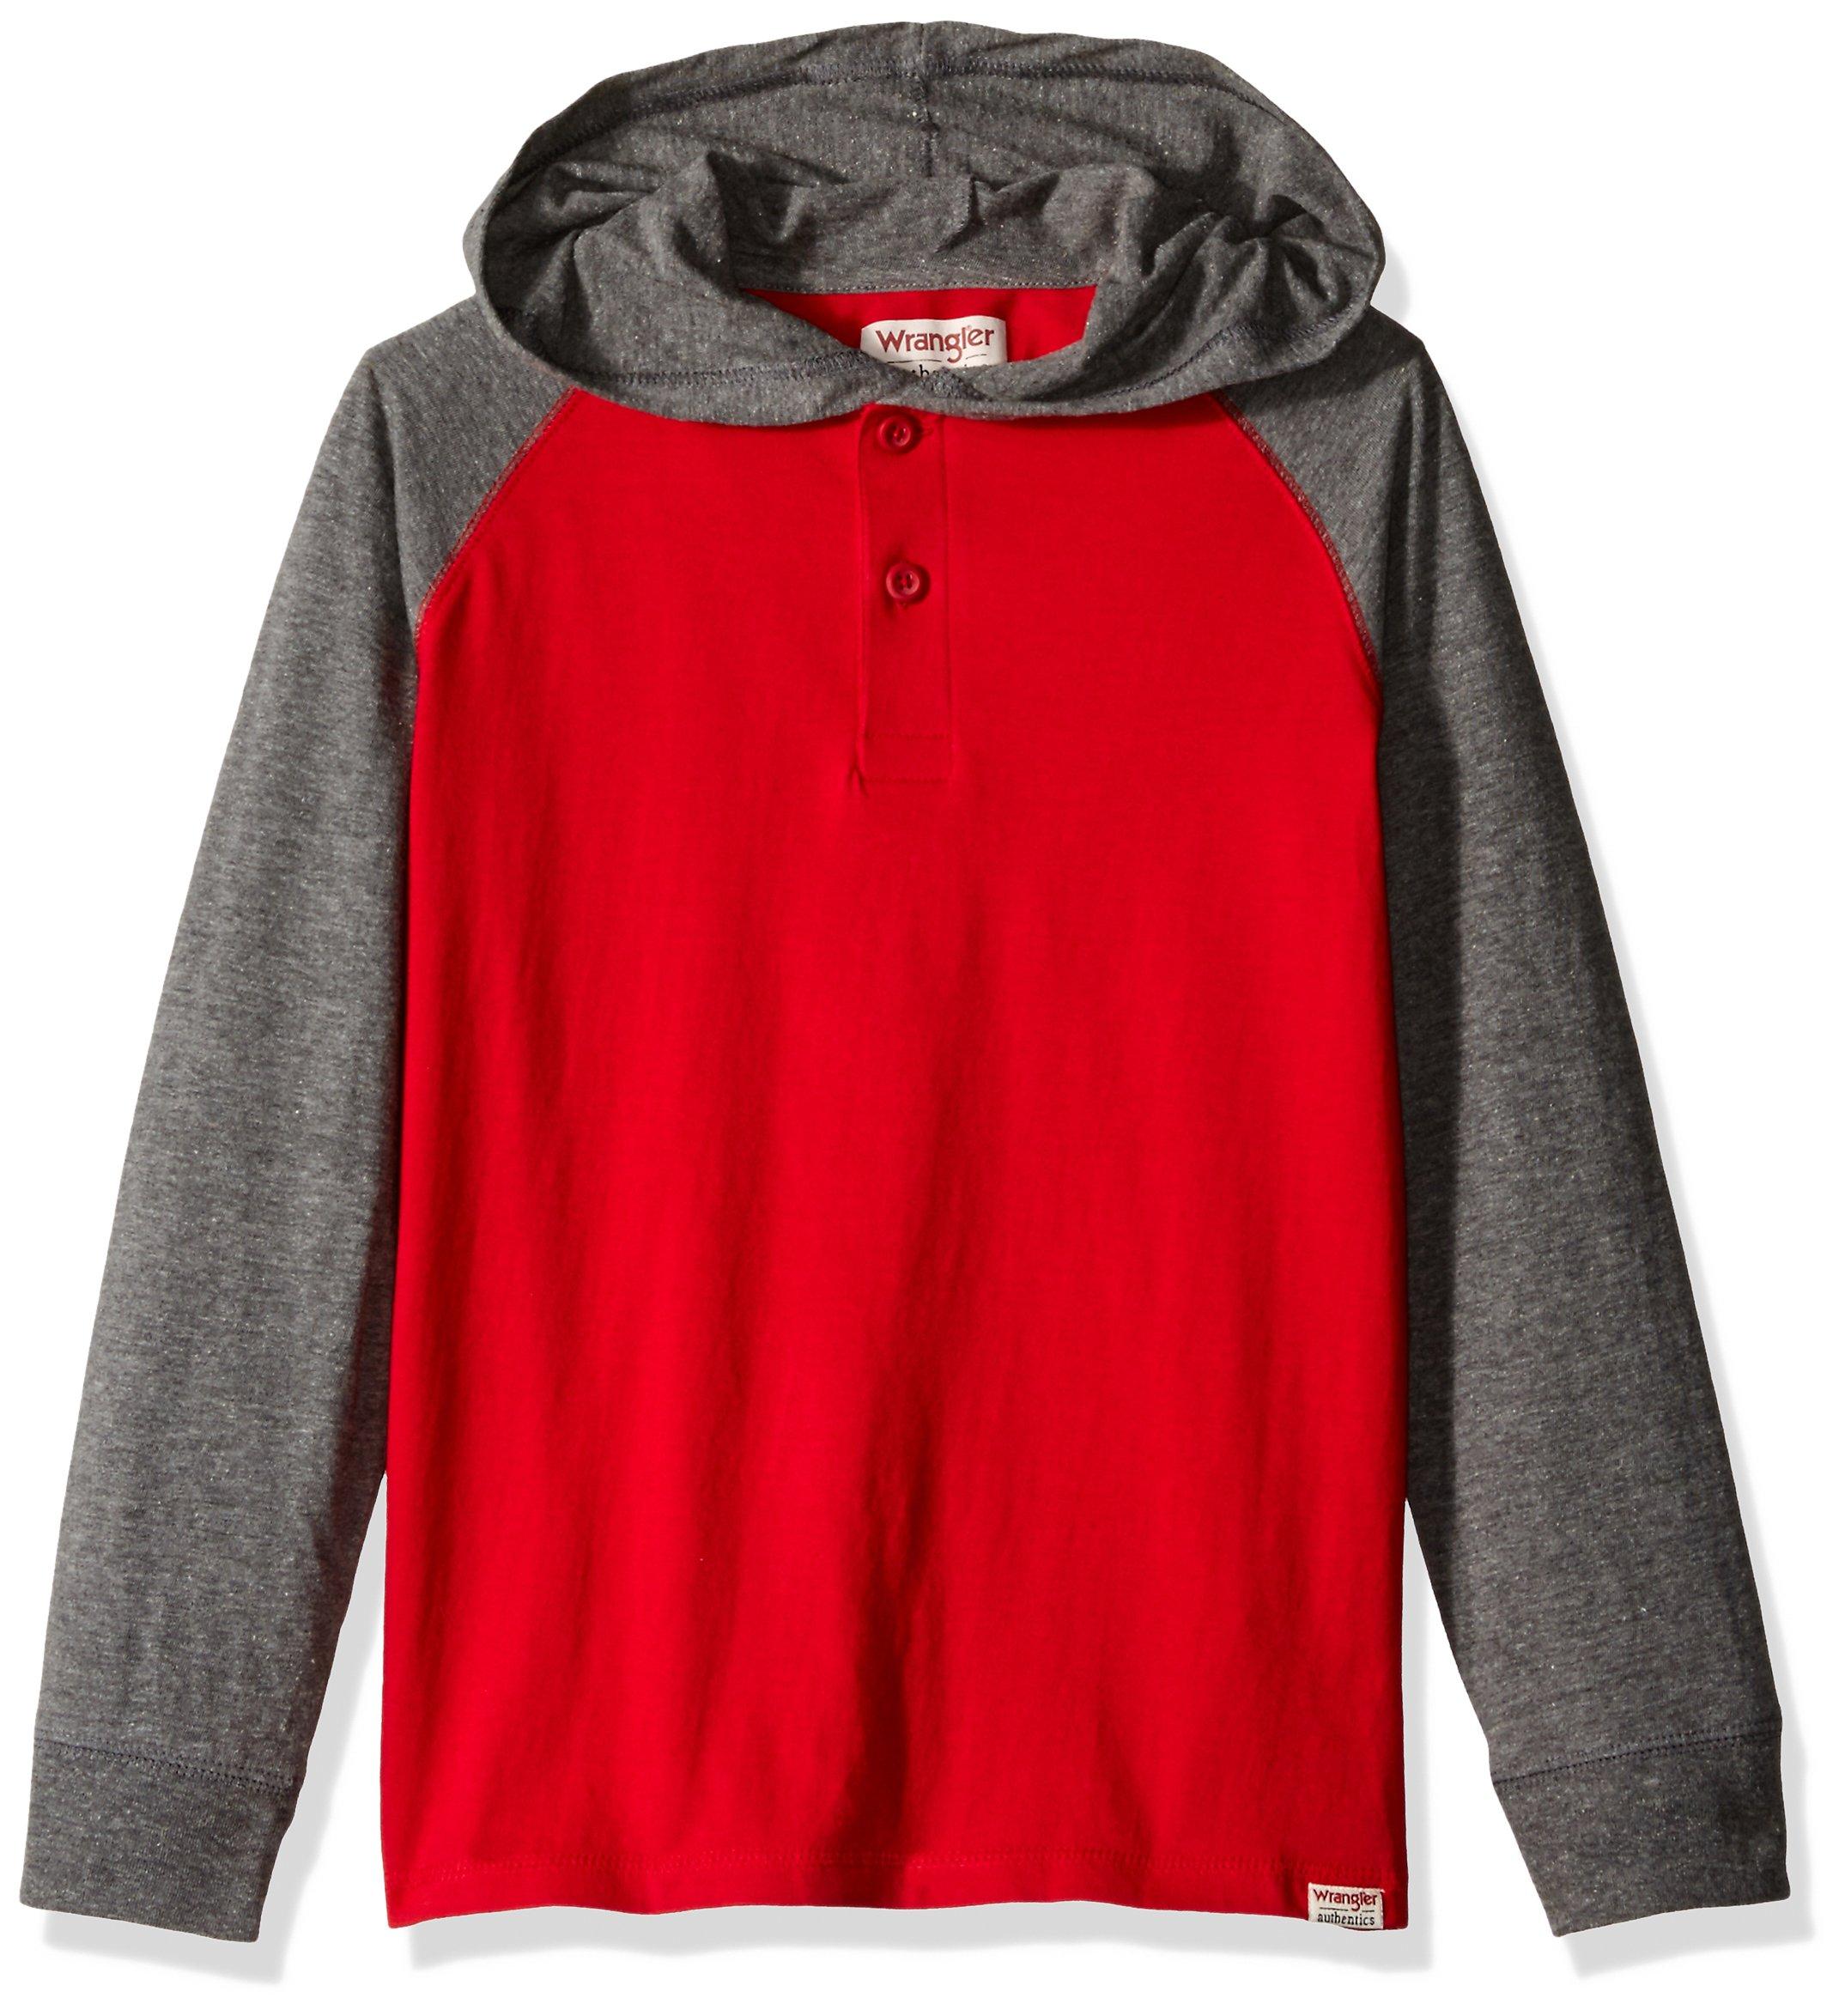 Wrangler Big Boys' Authentics Long Sleeve Hoodie, Red/Charcoal Heather, Medium